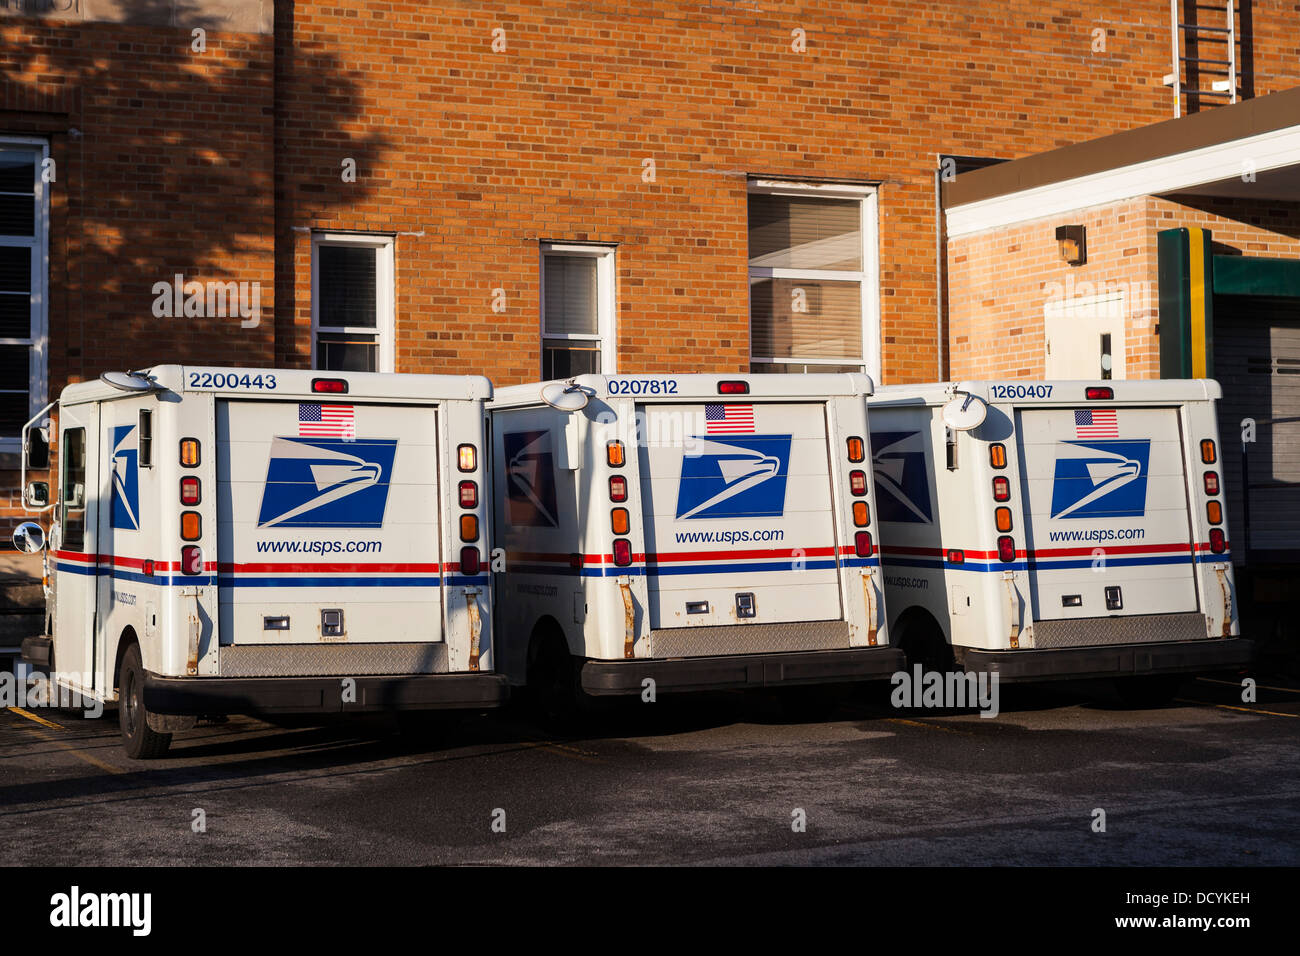 United States Postal Service trucks, USPS - Stock Image